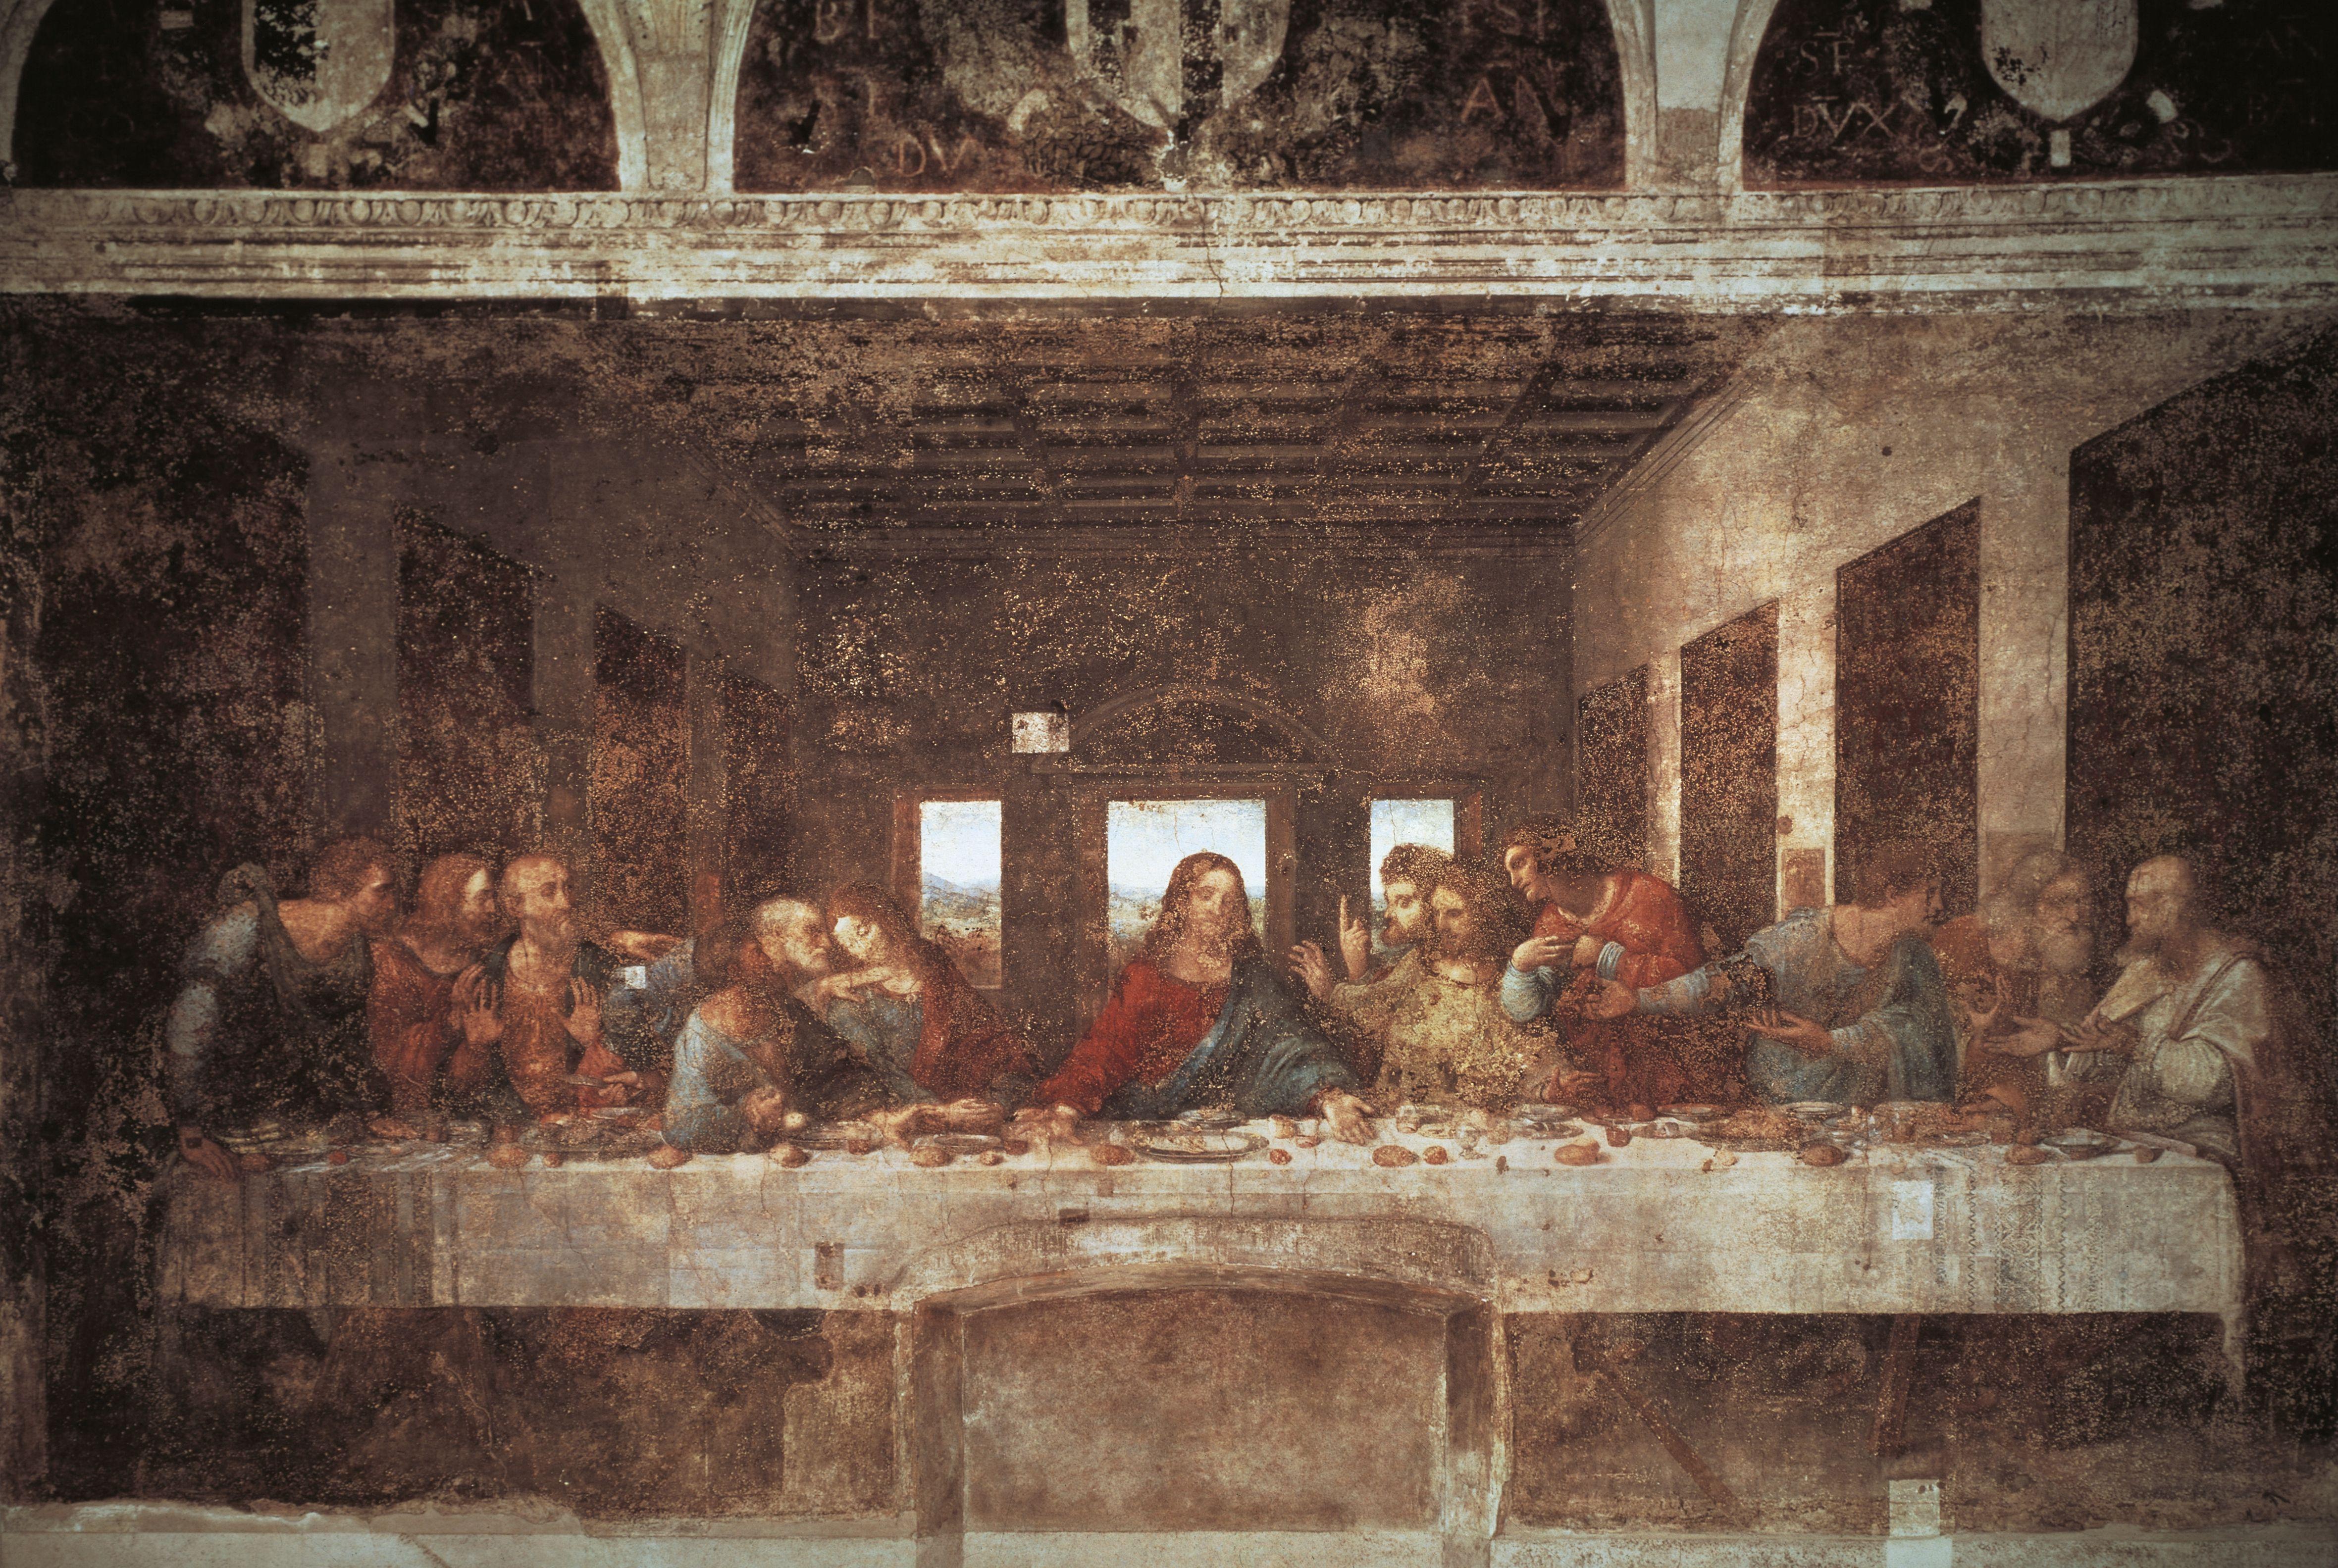 Seeing Da Vinci's The Last Supper in Milan